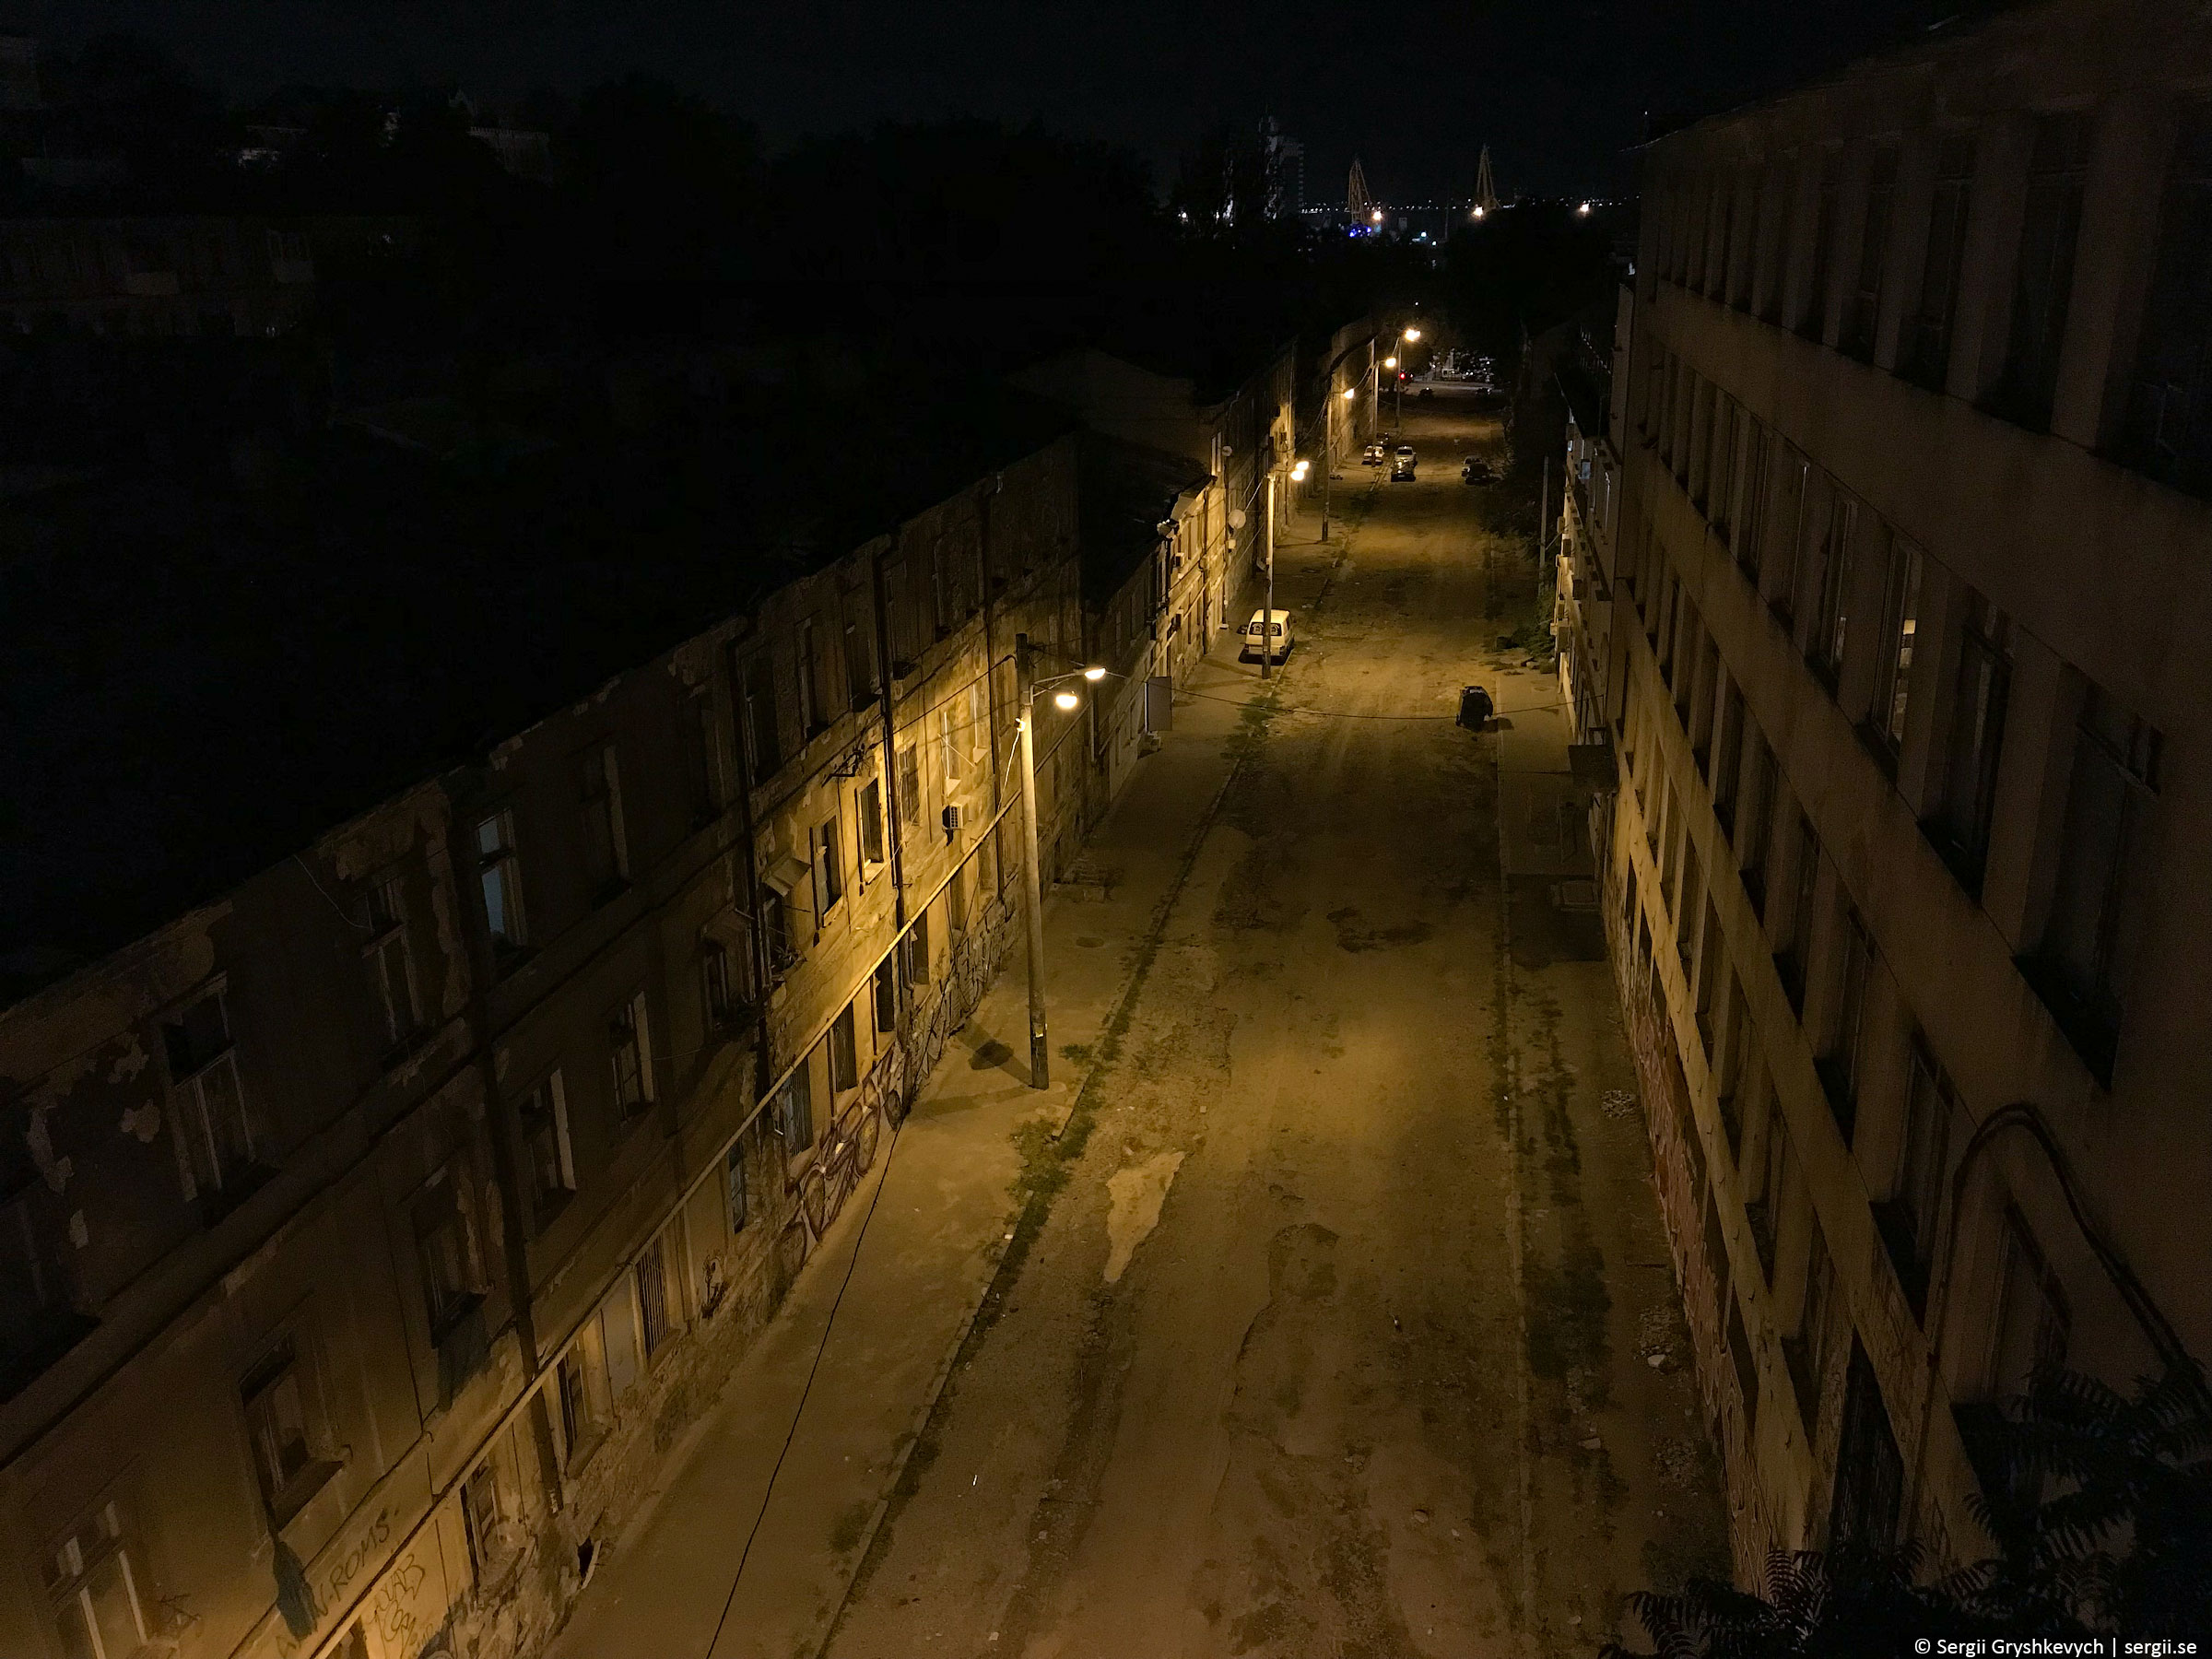 odesa-ukraine-2018-27